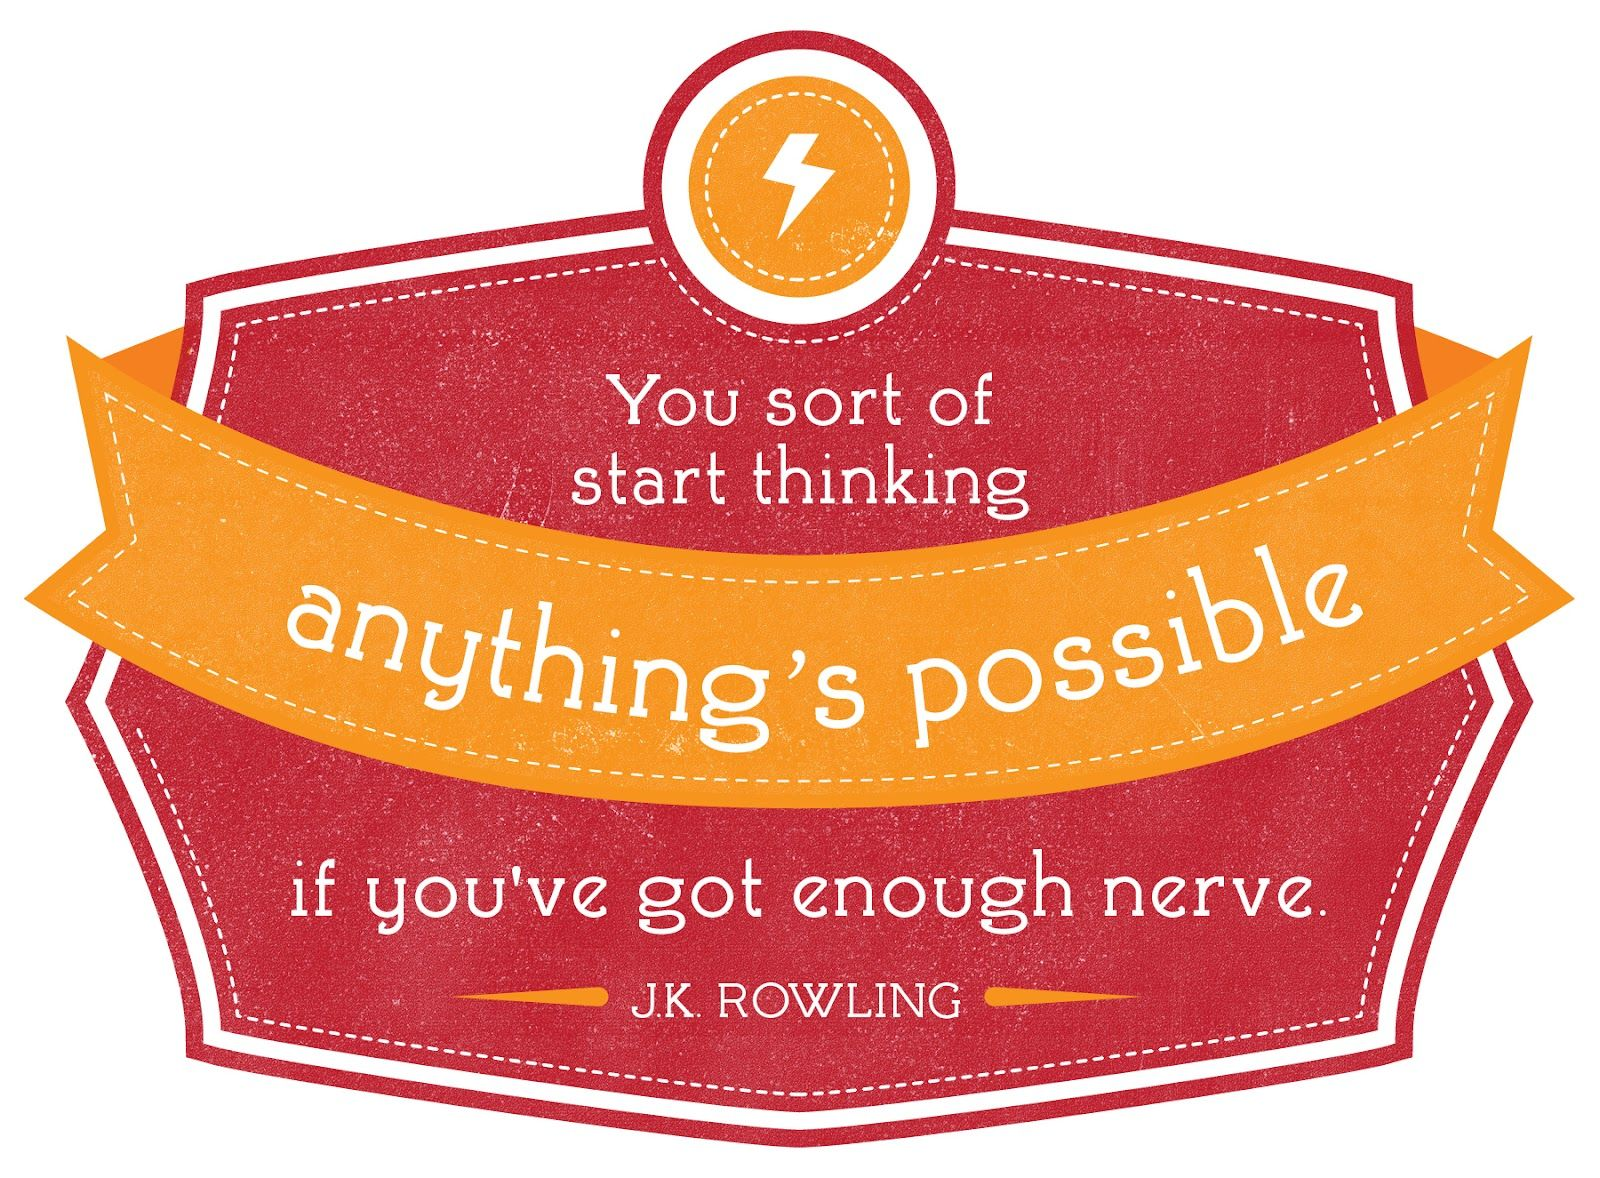 Rowling Wisdom Rowling Wisdom Shenanigans